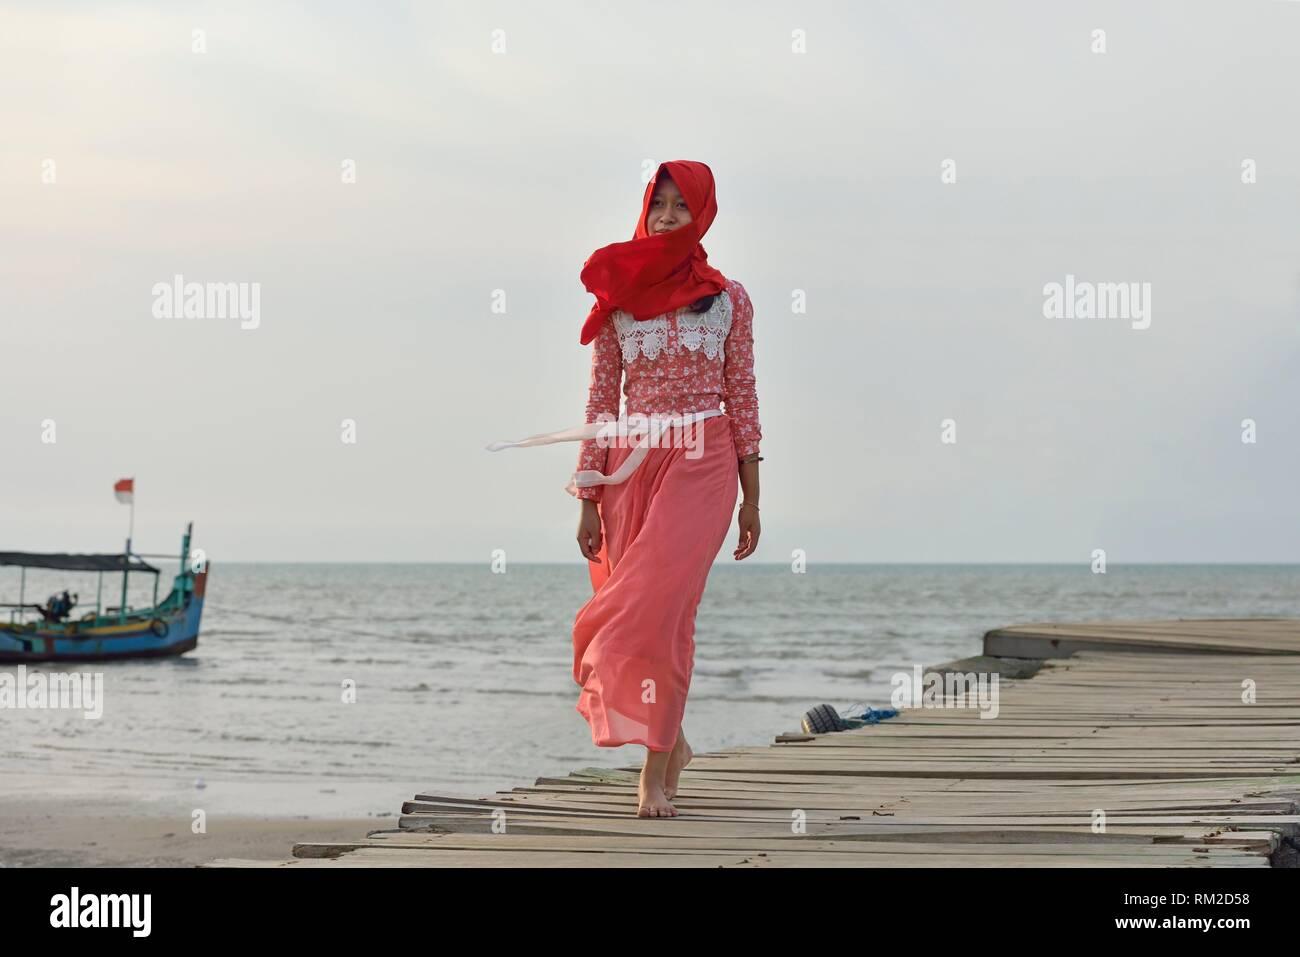 young woman walking on a pontoon at Karangjahe Beach near Lasem, Java island, Indonesia, Southeast Asia. - Stock Image